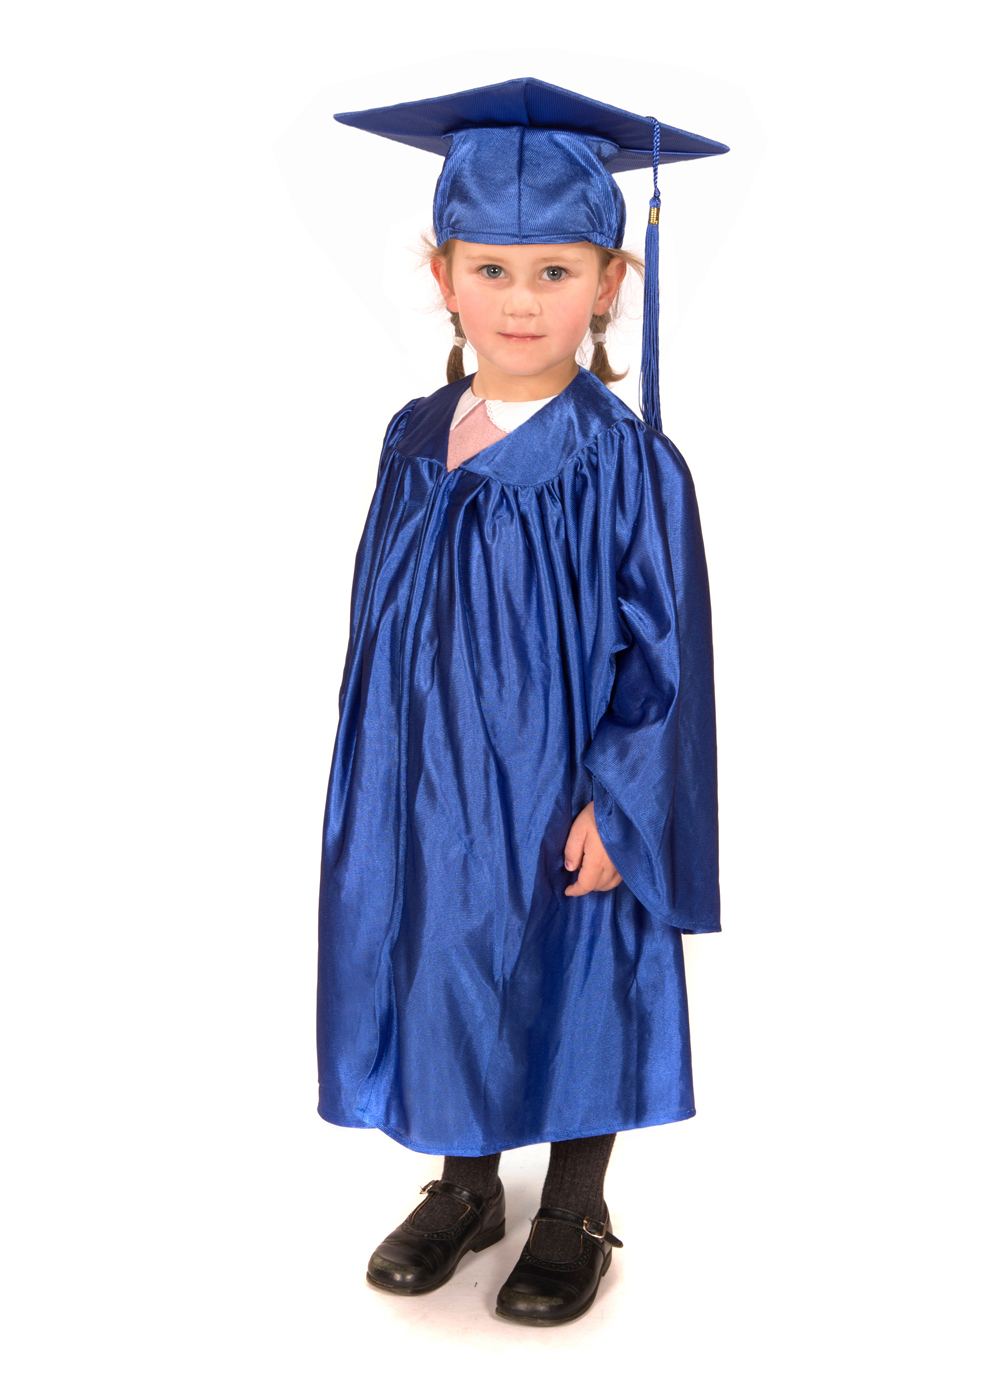 Children\'s Graduation Ceremonies with Graduation Attire